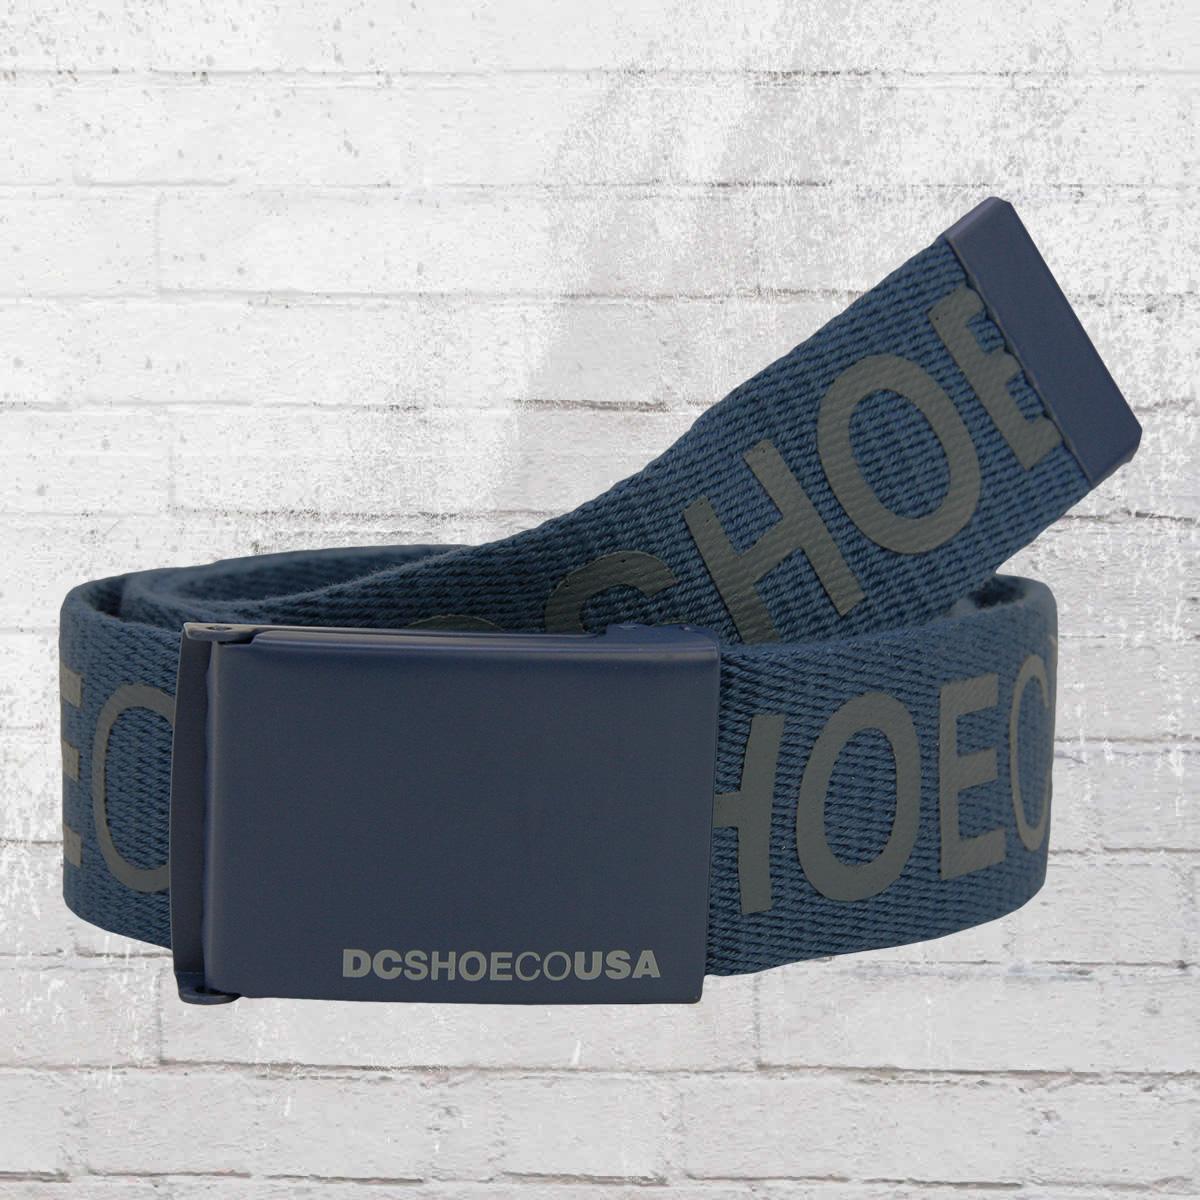 DC Shoes Wende Stoff Gürtel Chinook 6 Reversible Belt Blau Grau Amazing Ideas